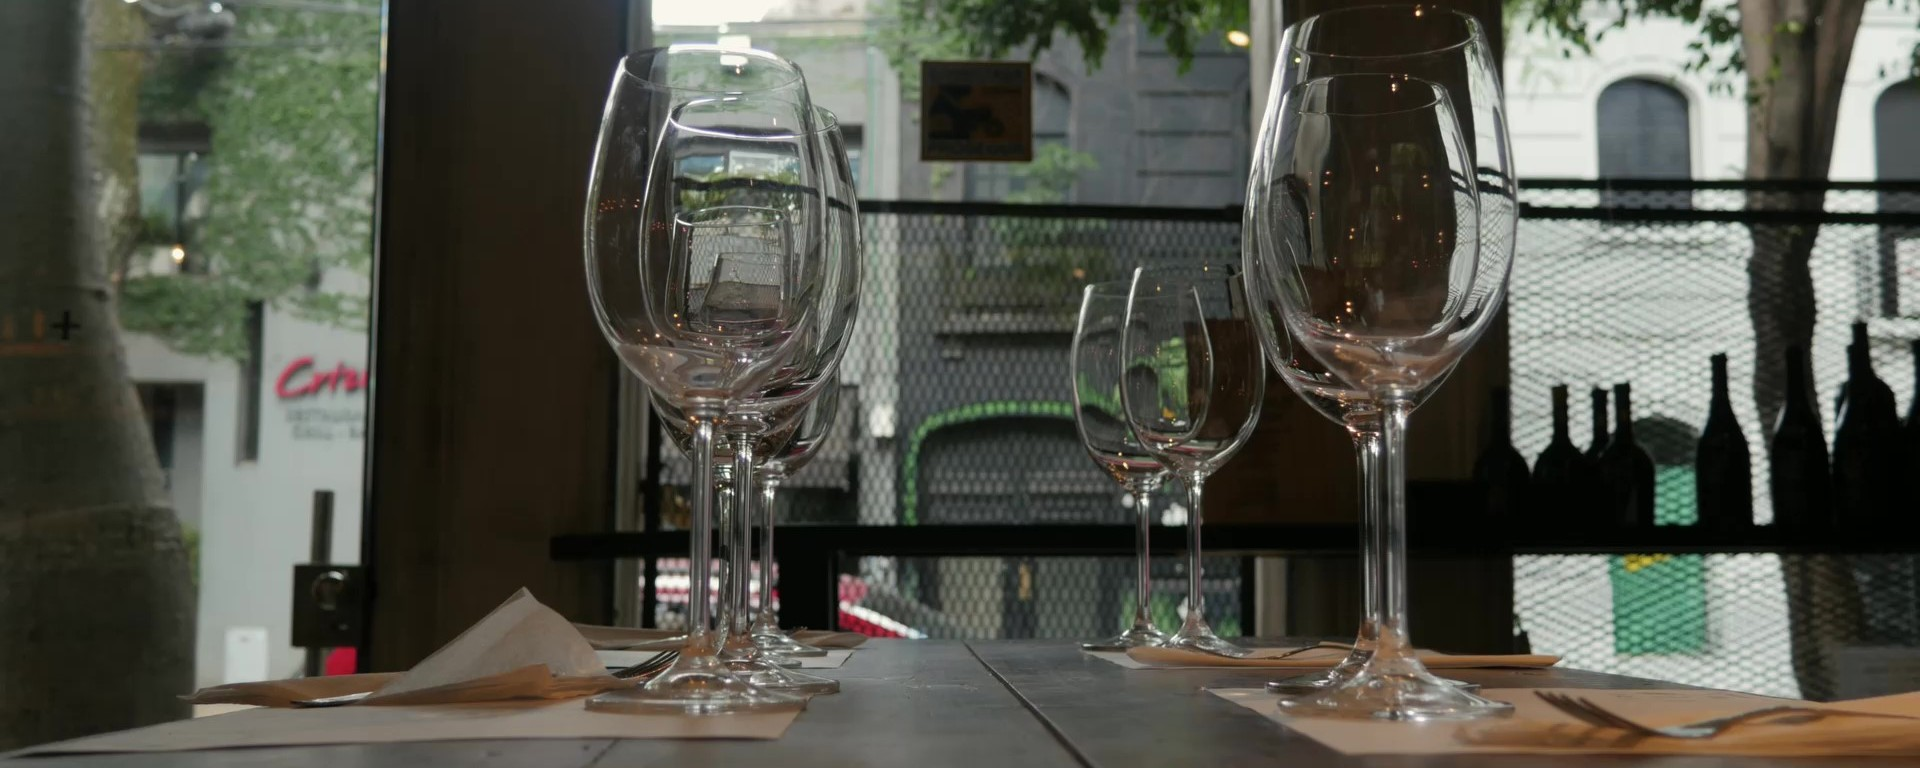 Economy and Wine in Argentina